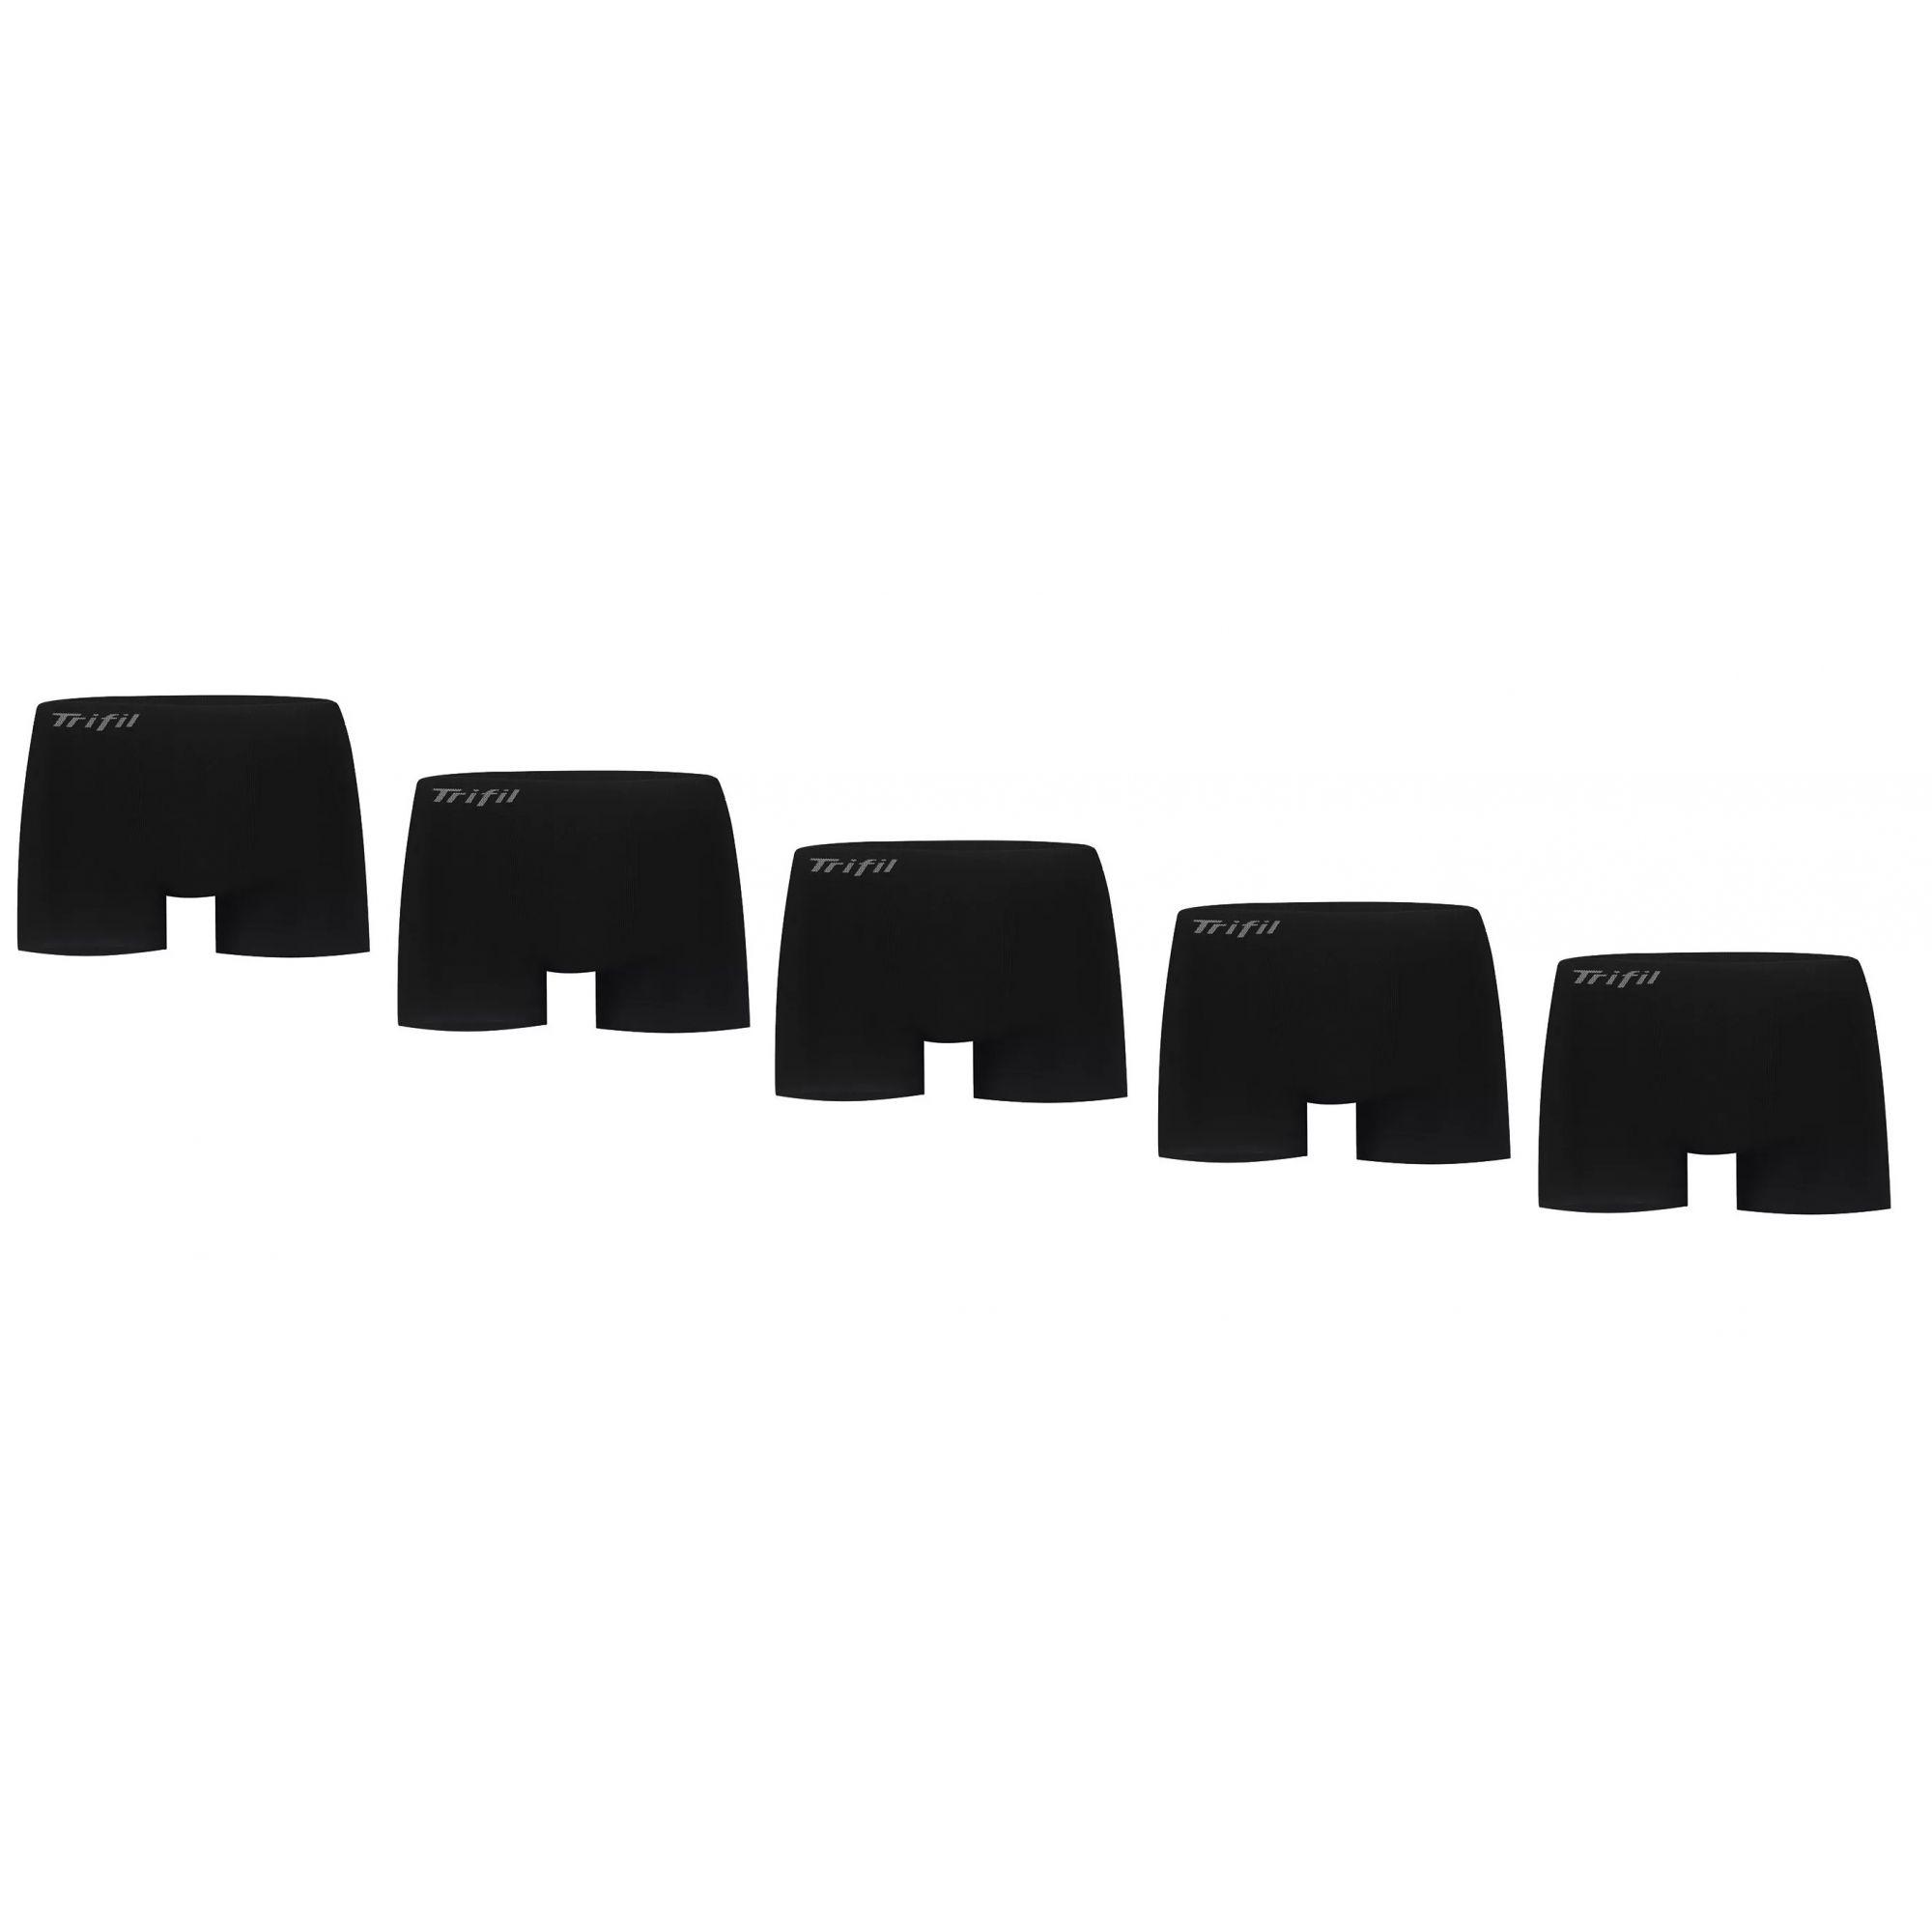 Kit 5 Cuecas Boxer Trifil Microfibra Plus Size 54-64 Ce4411